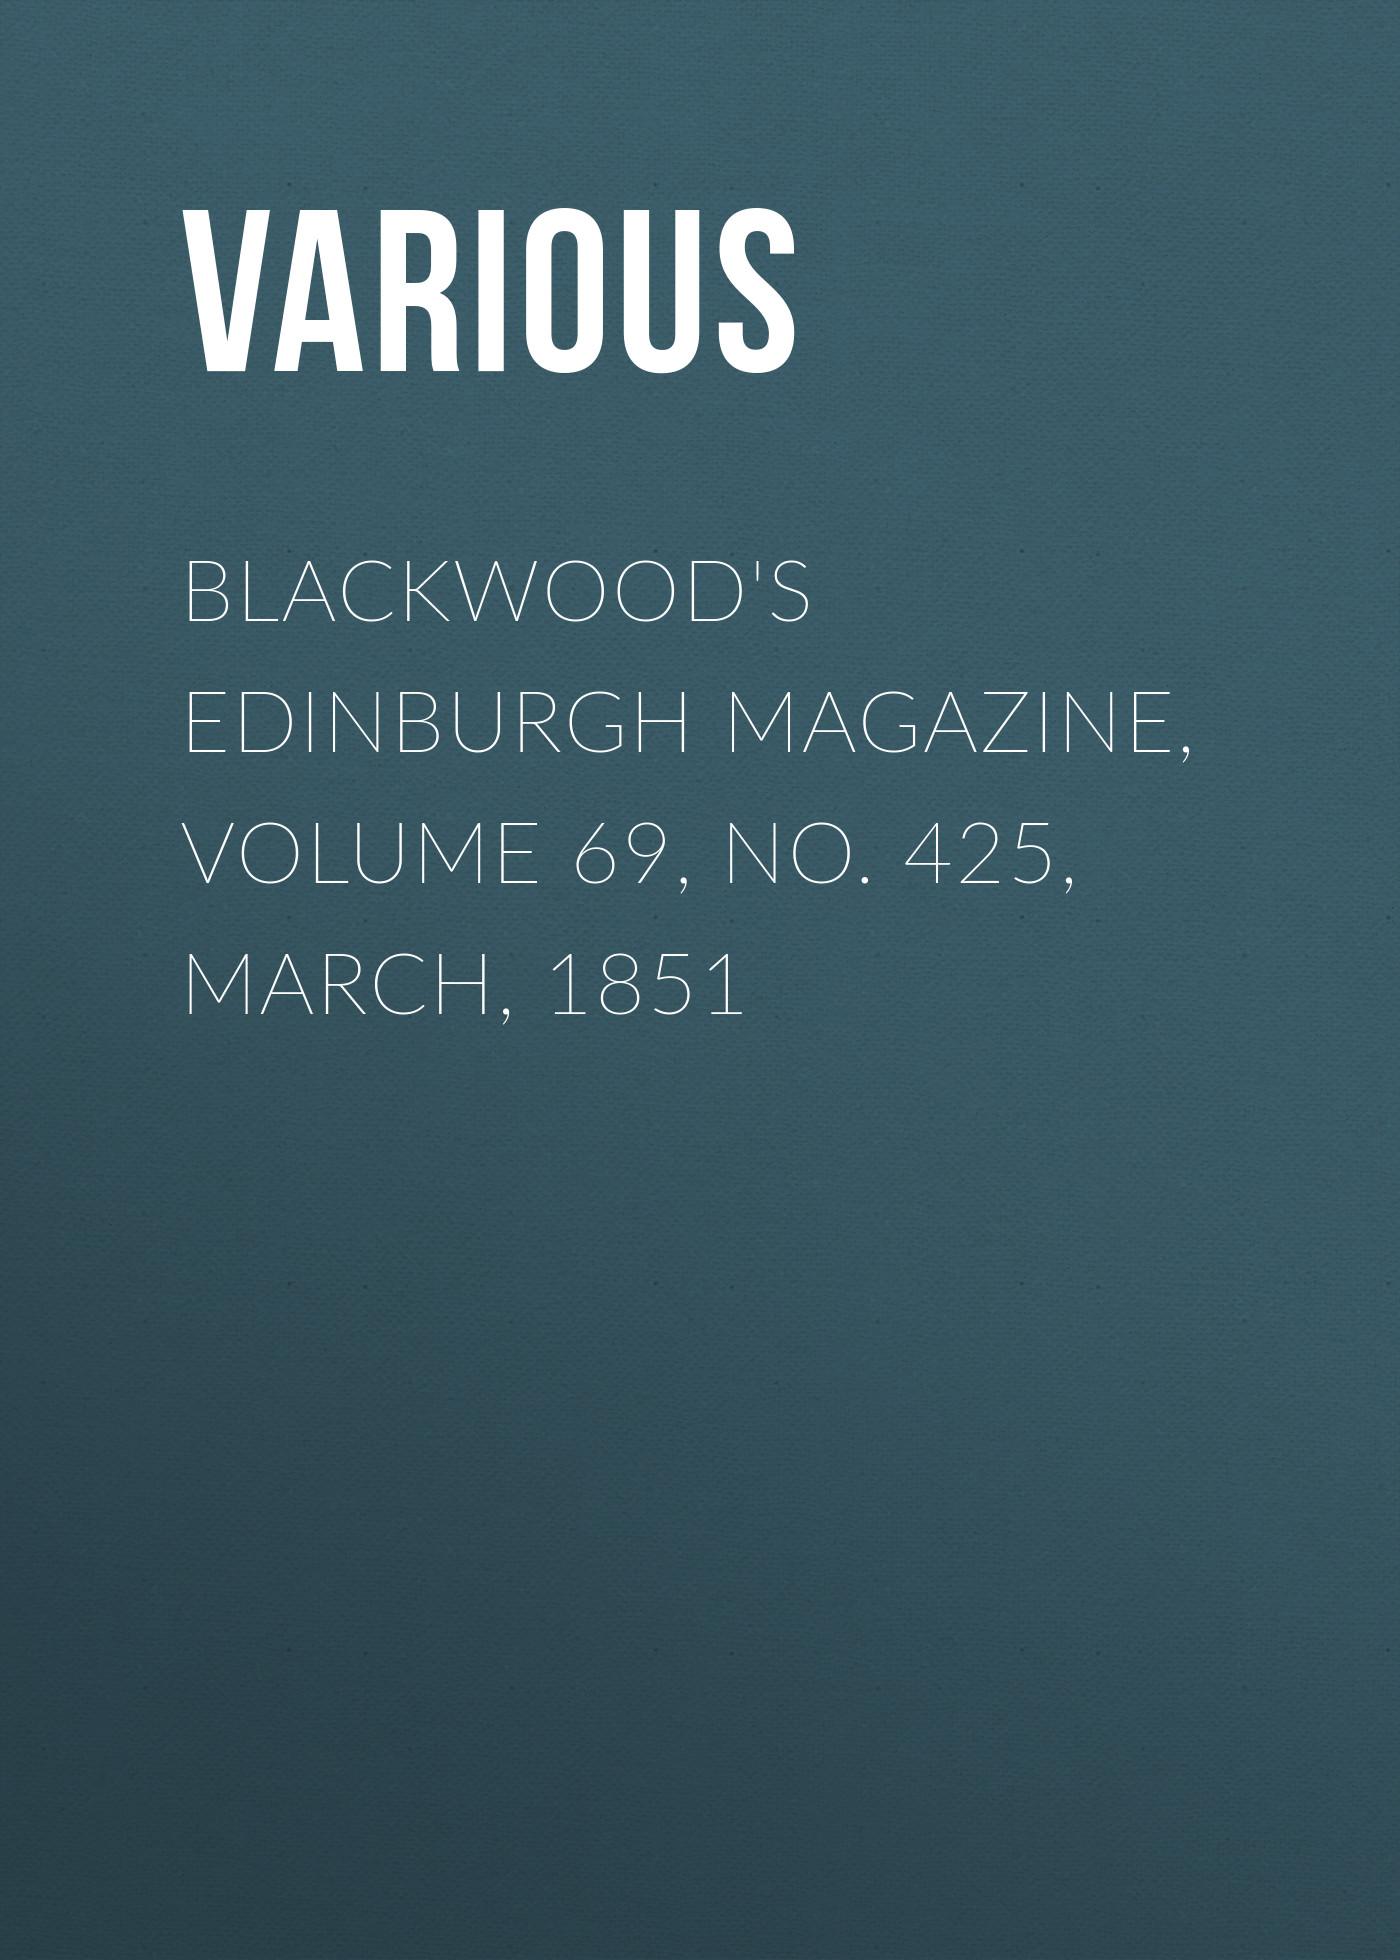 лучшая цена Various Blackwood's Edinburgh Magazine, Volume 69, No. 425, March, 1851